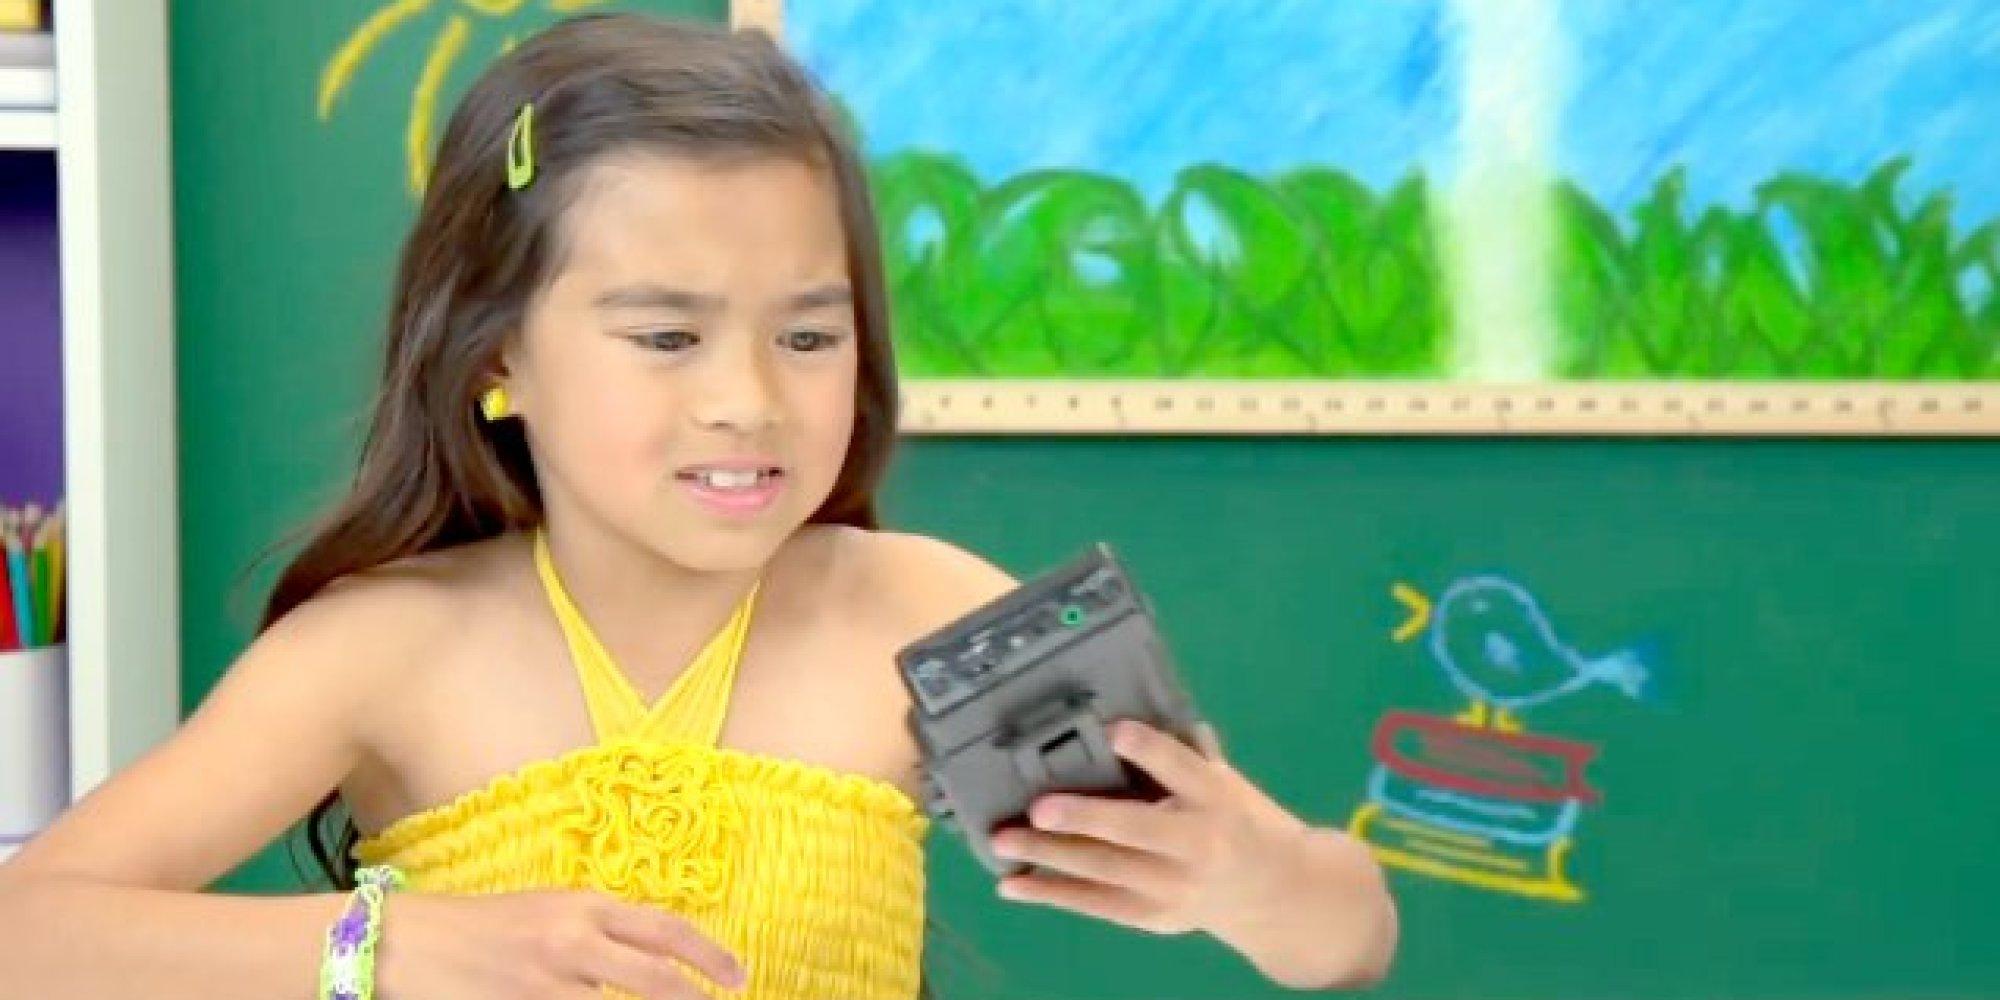 Watch kids react to odd black bricks formerly known as walkmans